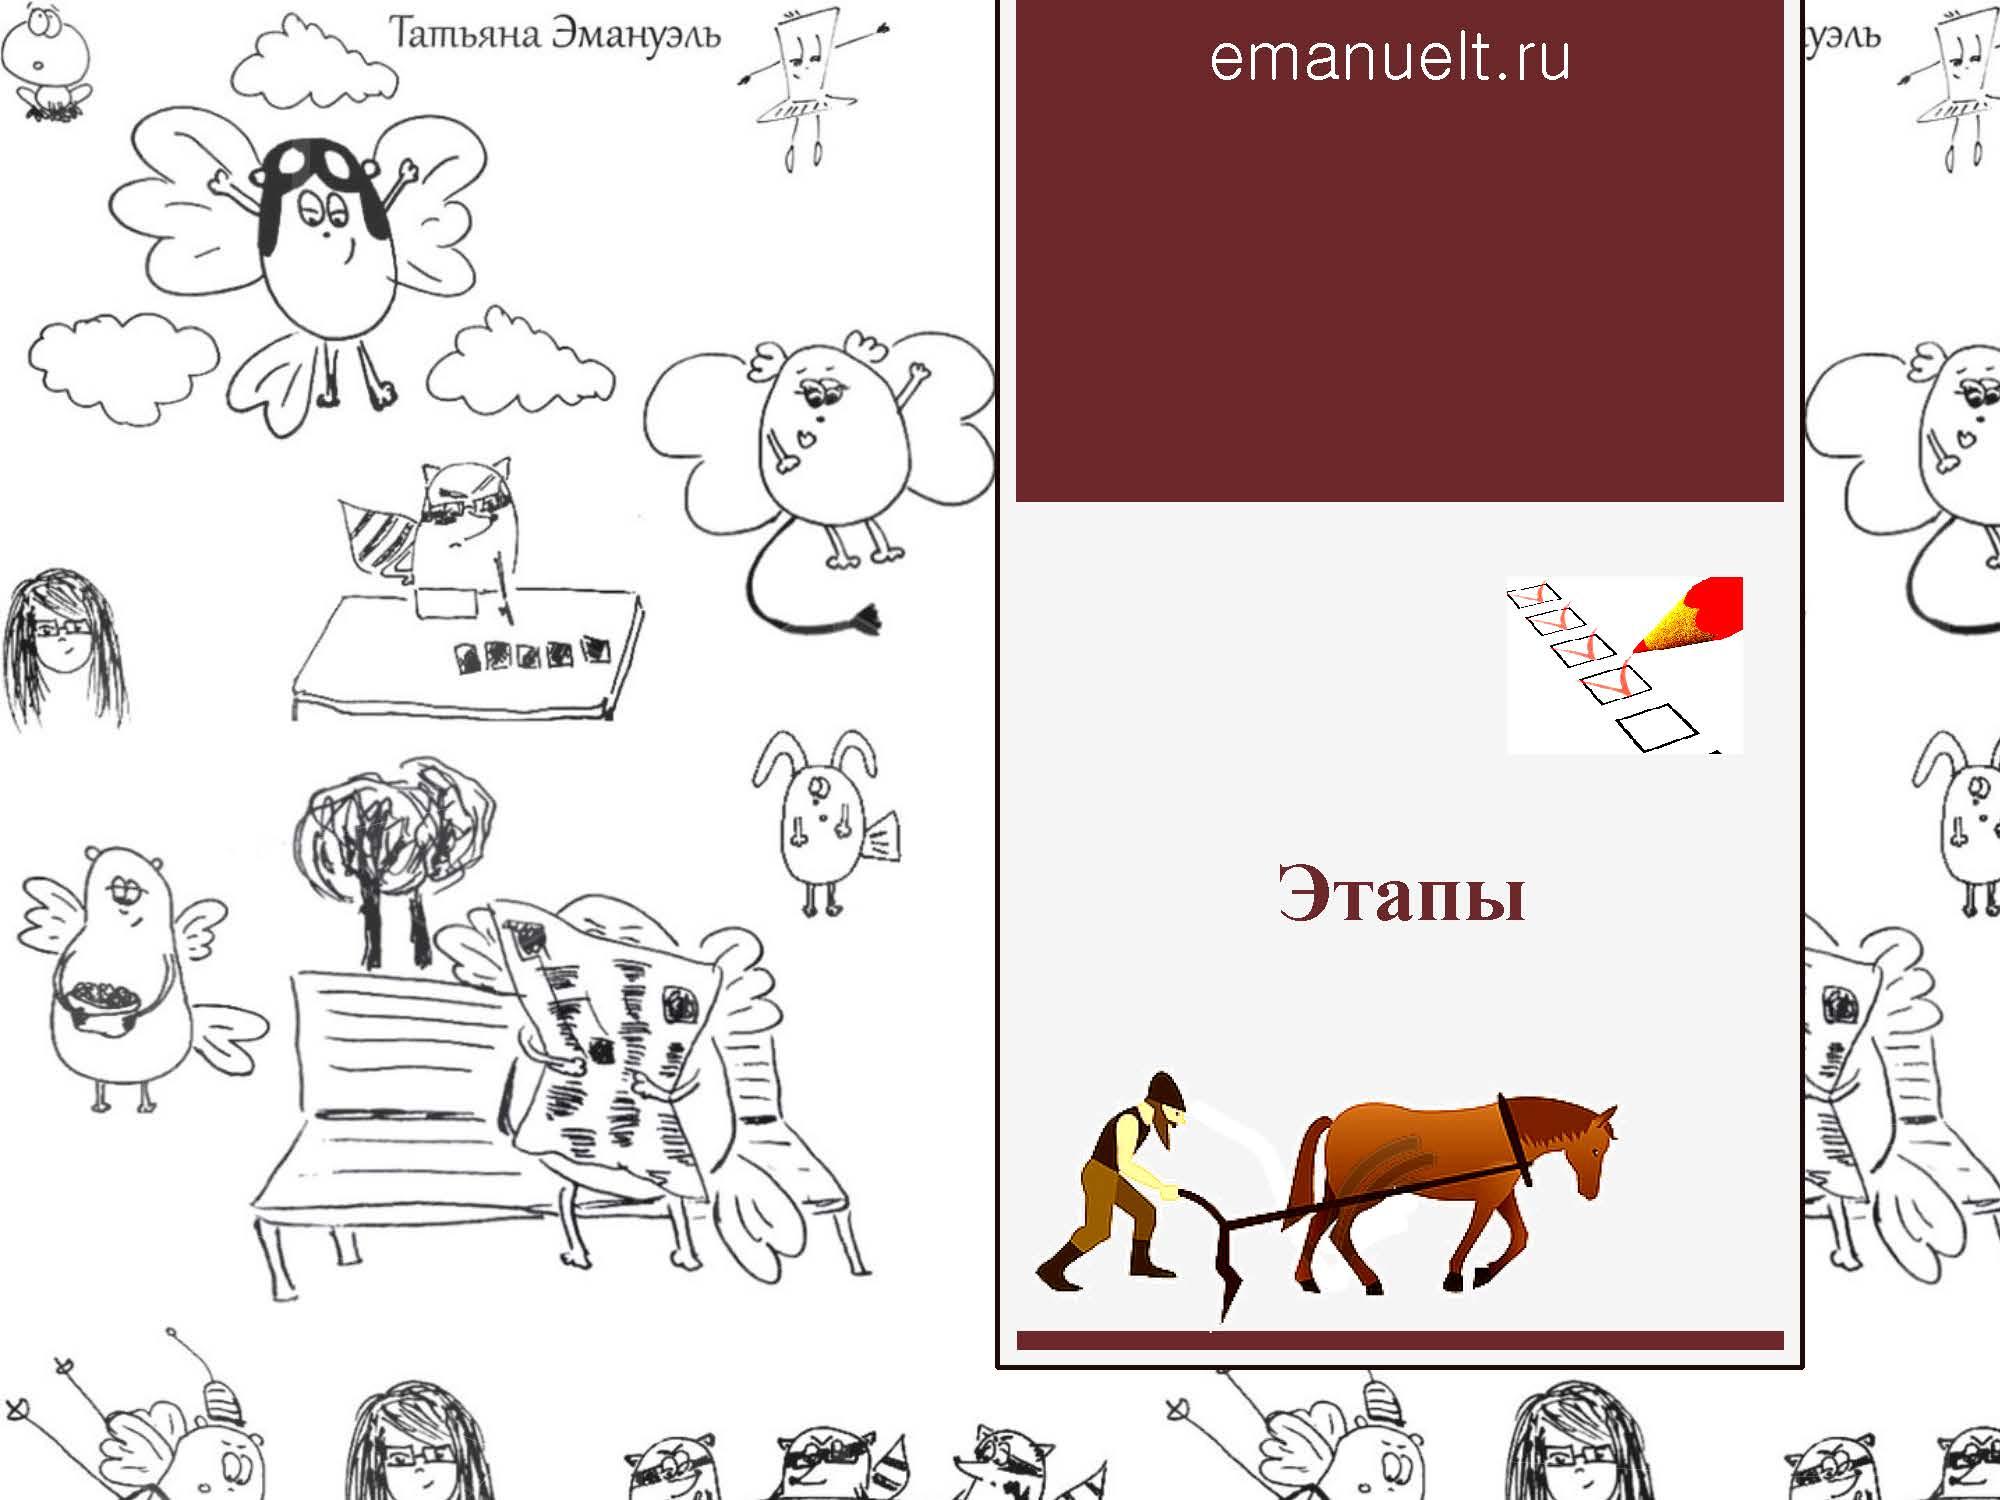 06 февраля эмануэль_Страница_043